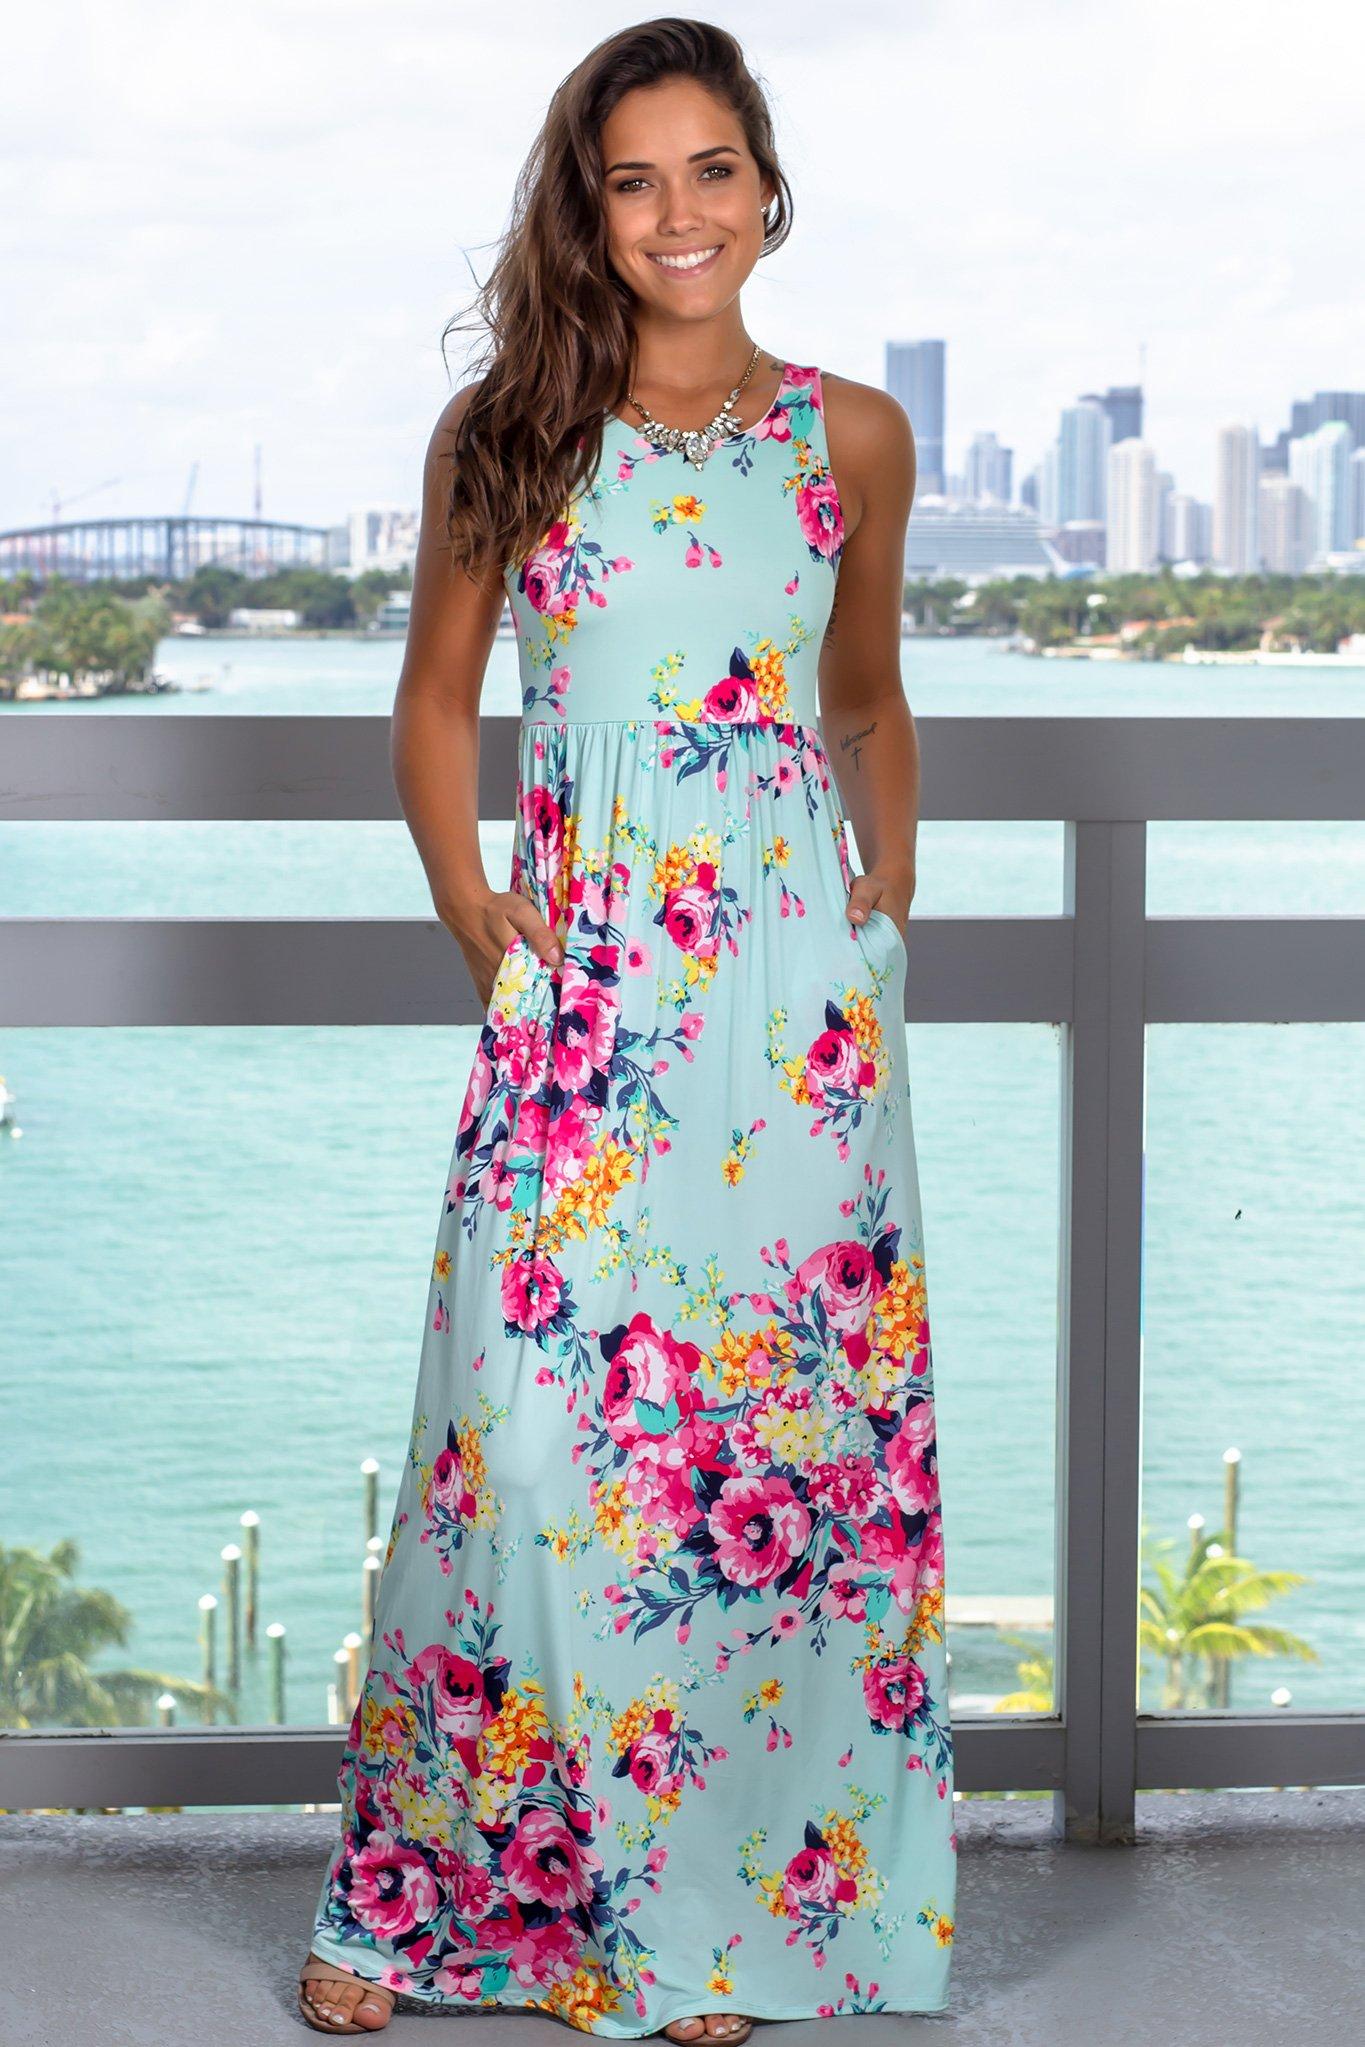 Mint Floral Racerback Maxi Dress With Pockets Maxi Dress Beautiful Maxi Dresses Dress For Short Women [ 2047 x 1365 Pixel ]